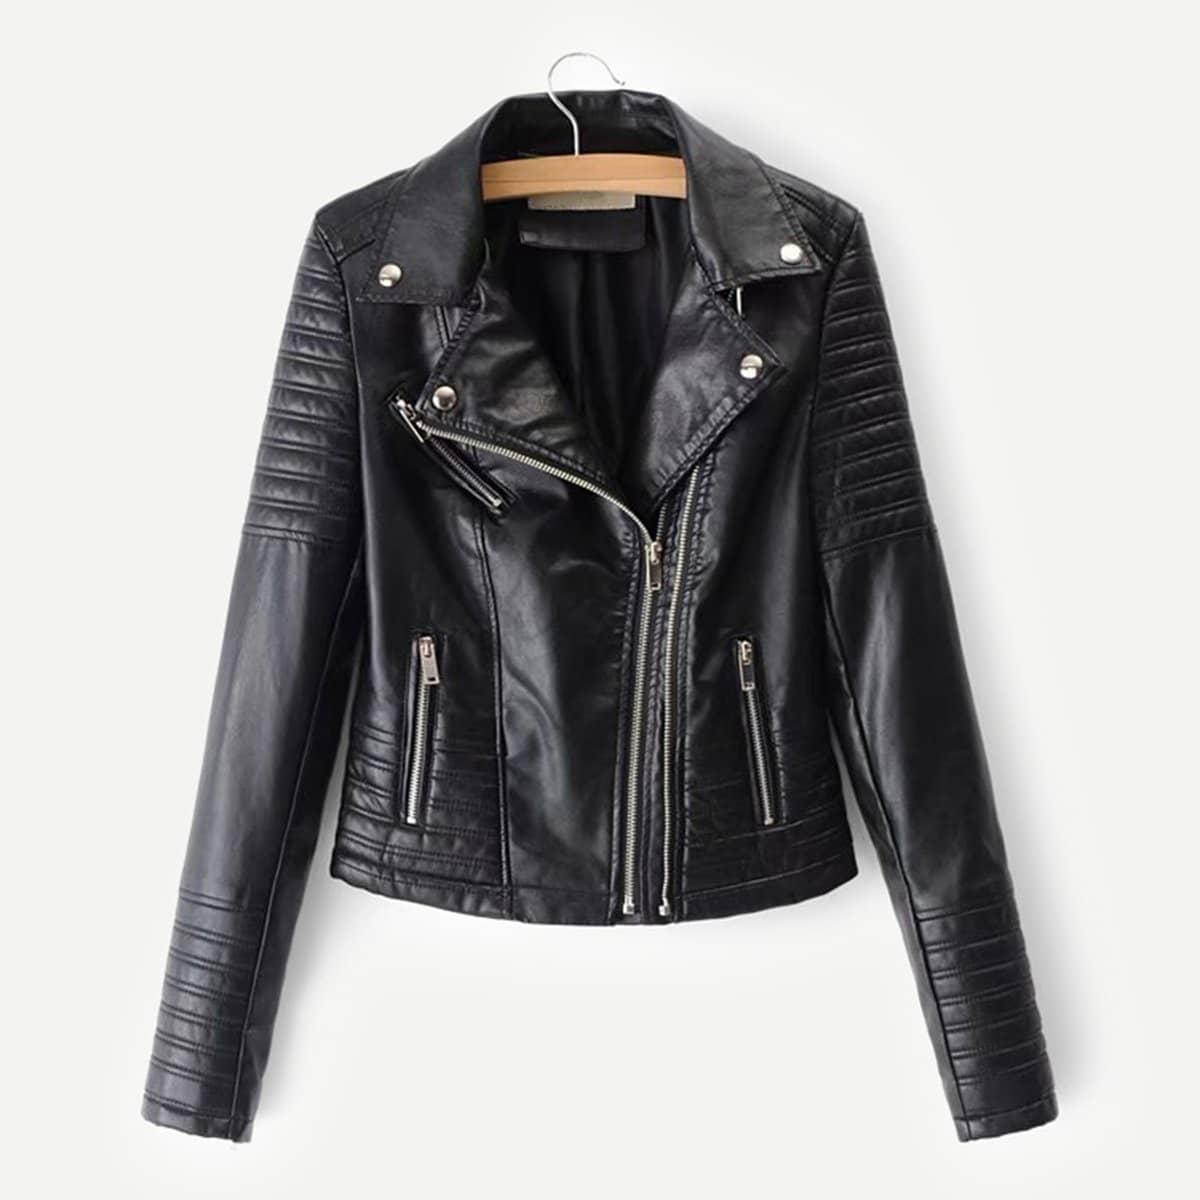 Katy Perry's Picks Faux Leather Biker Jacket